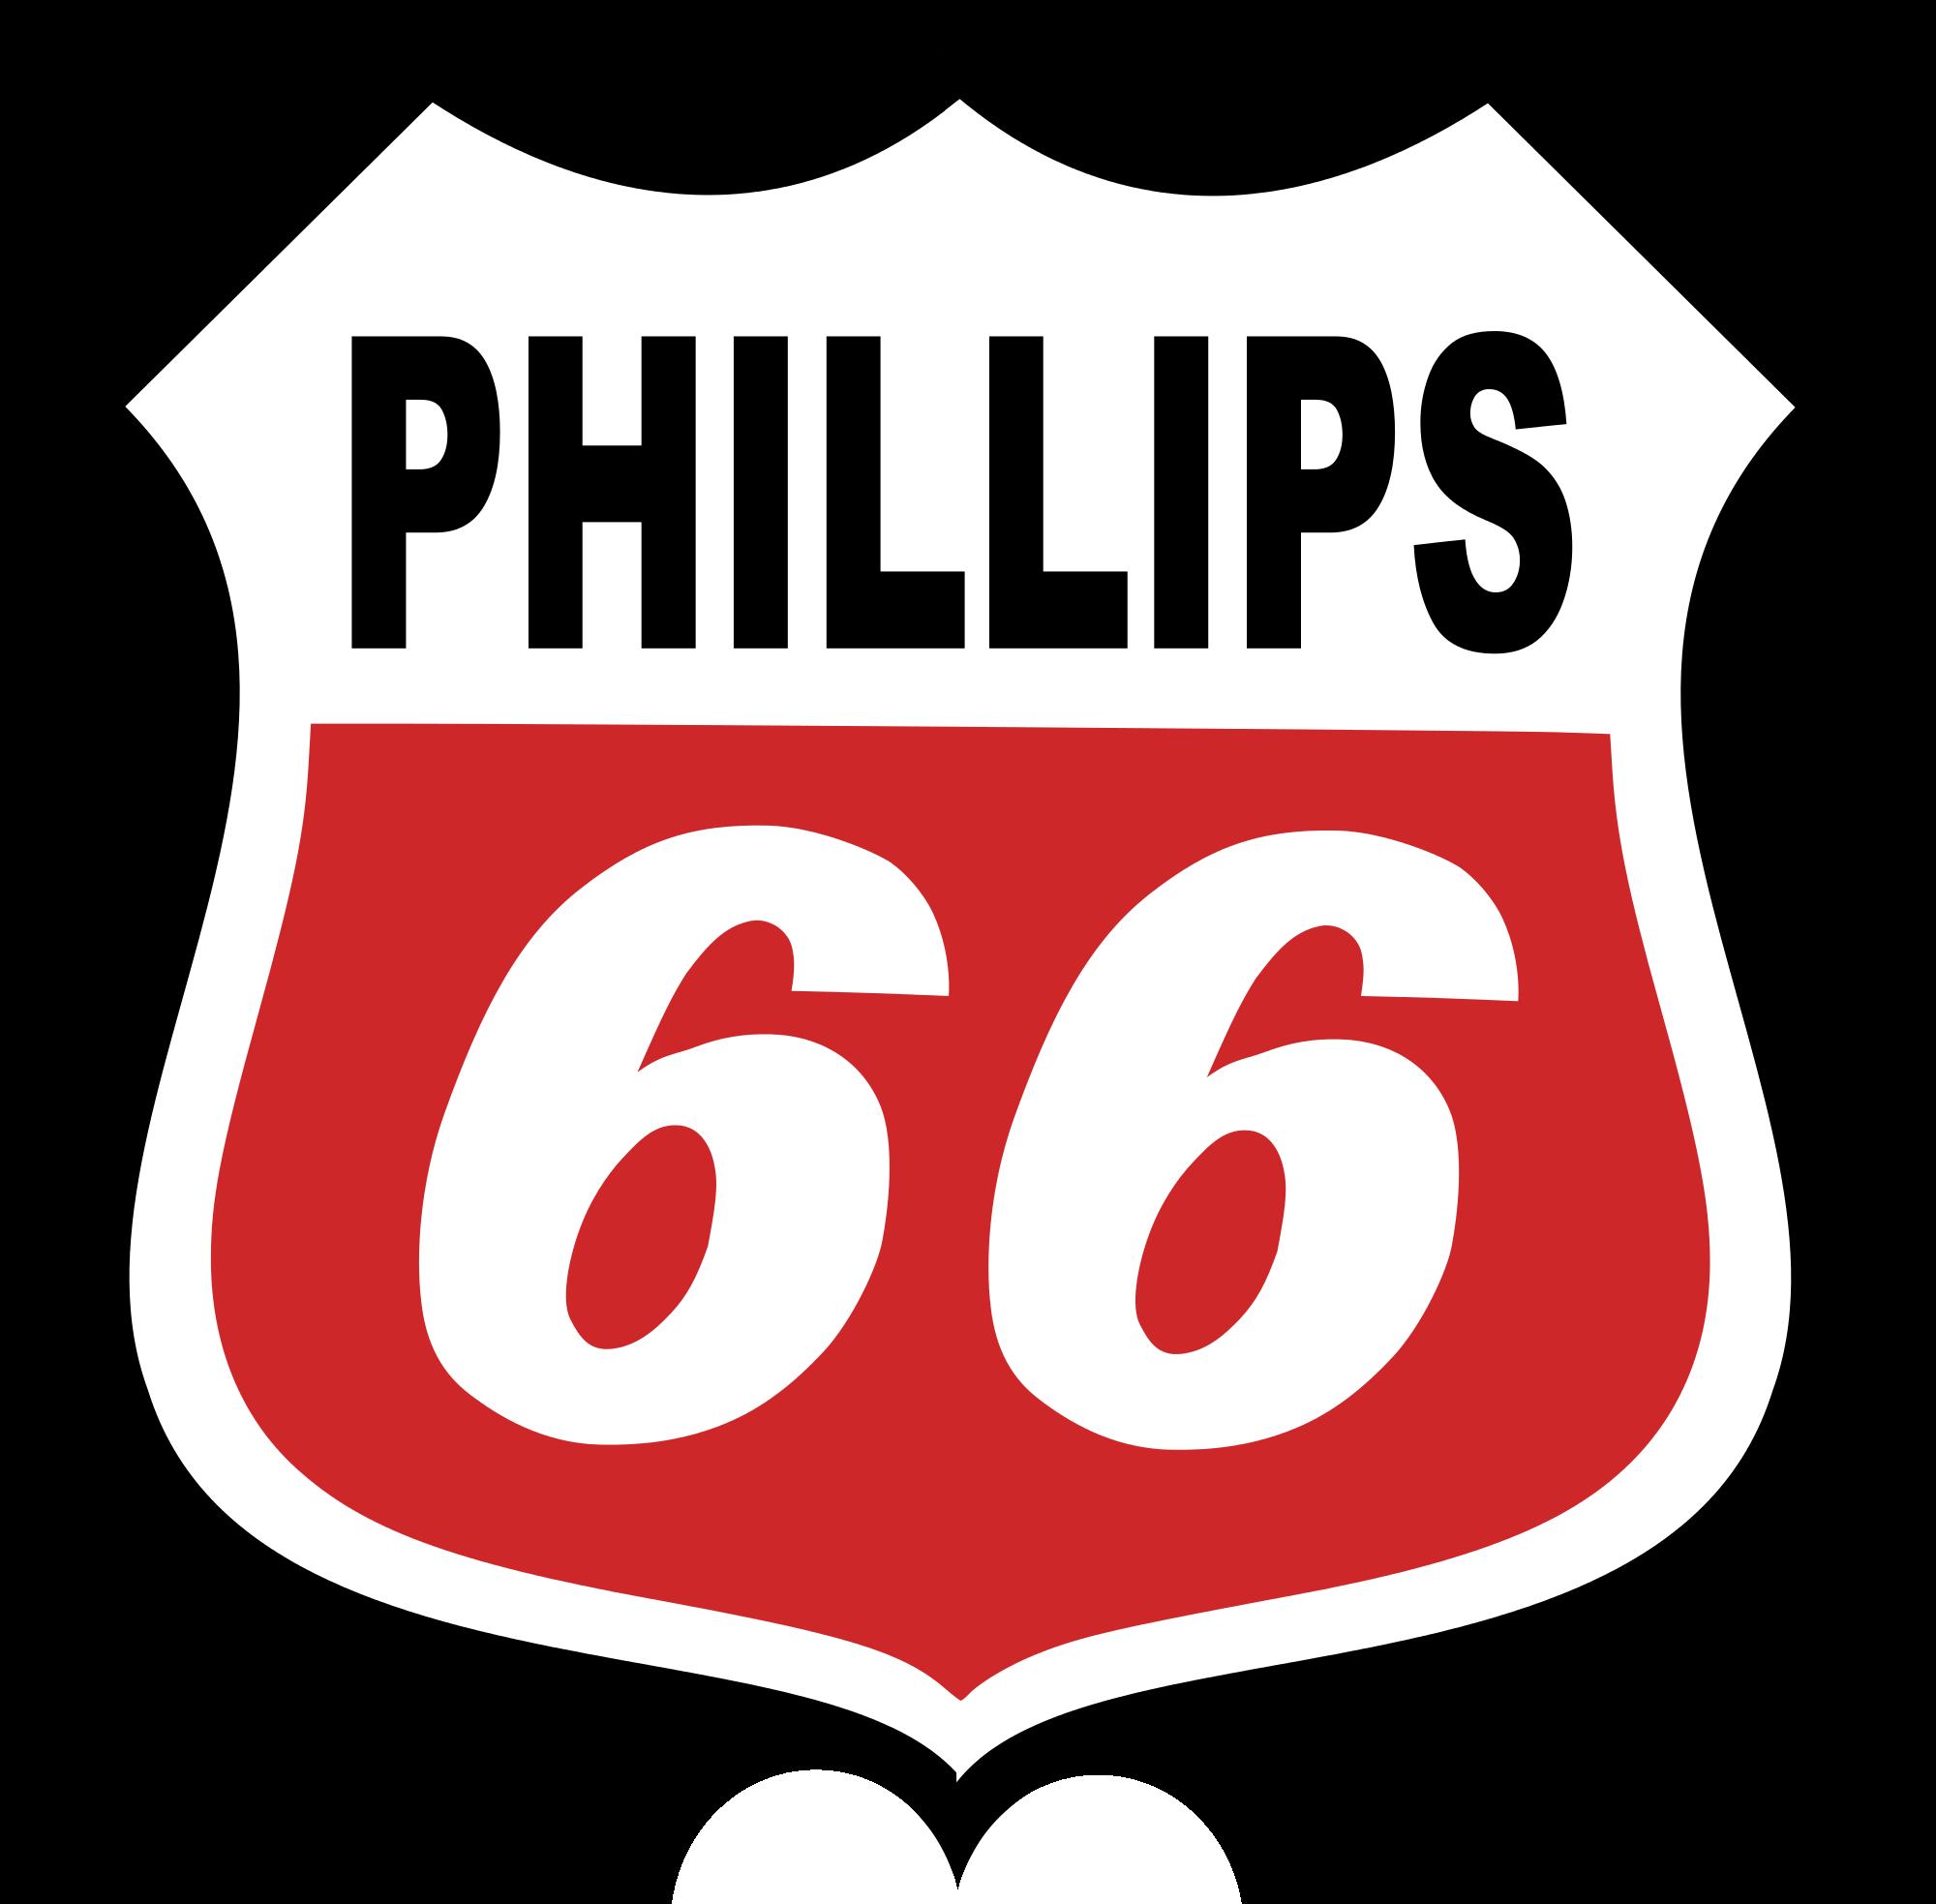 Phillips 66 Magnus Oil 320 Cross Reference